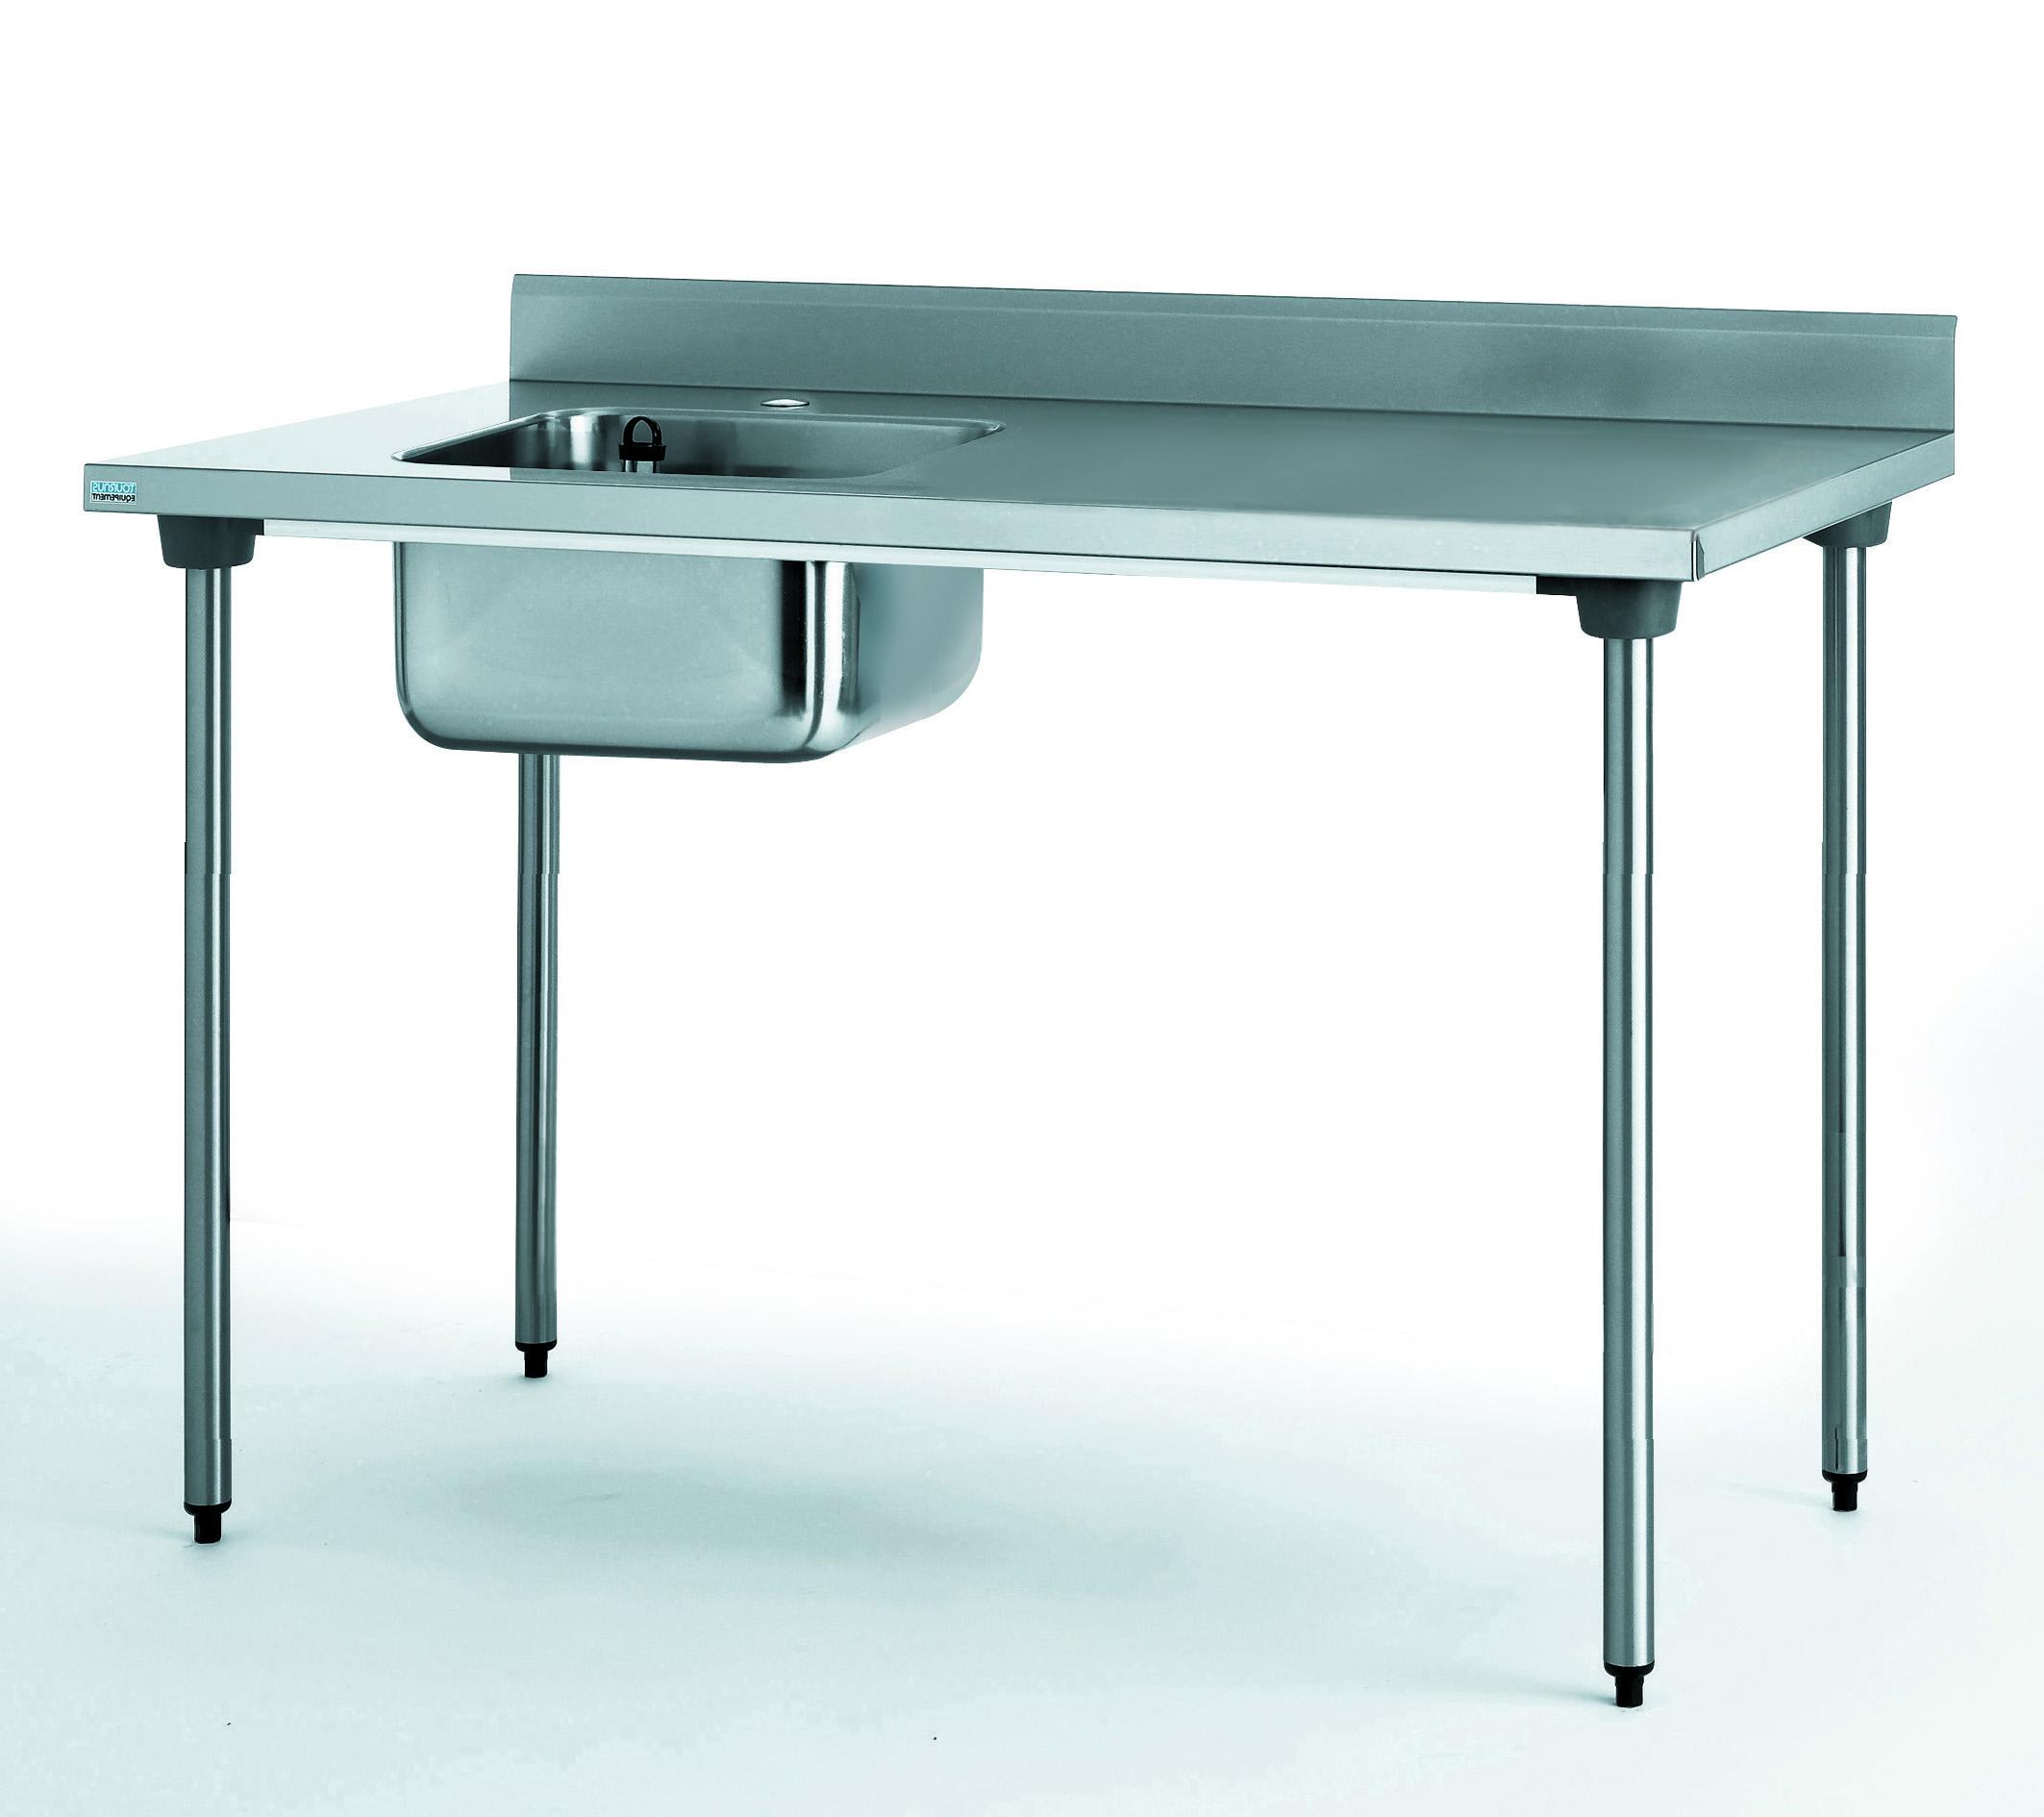 TABLE DU CHEF CHR 700X1400 BAC A GAUCHE SANS ROBINET